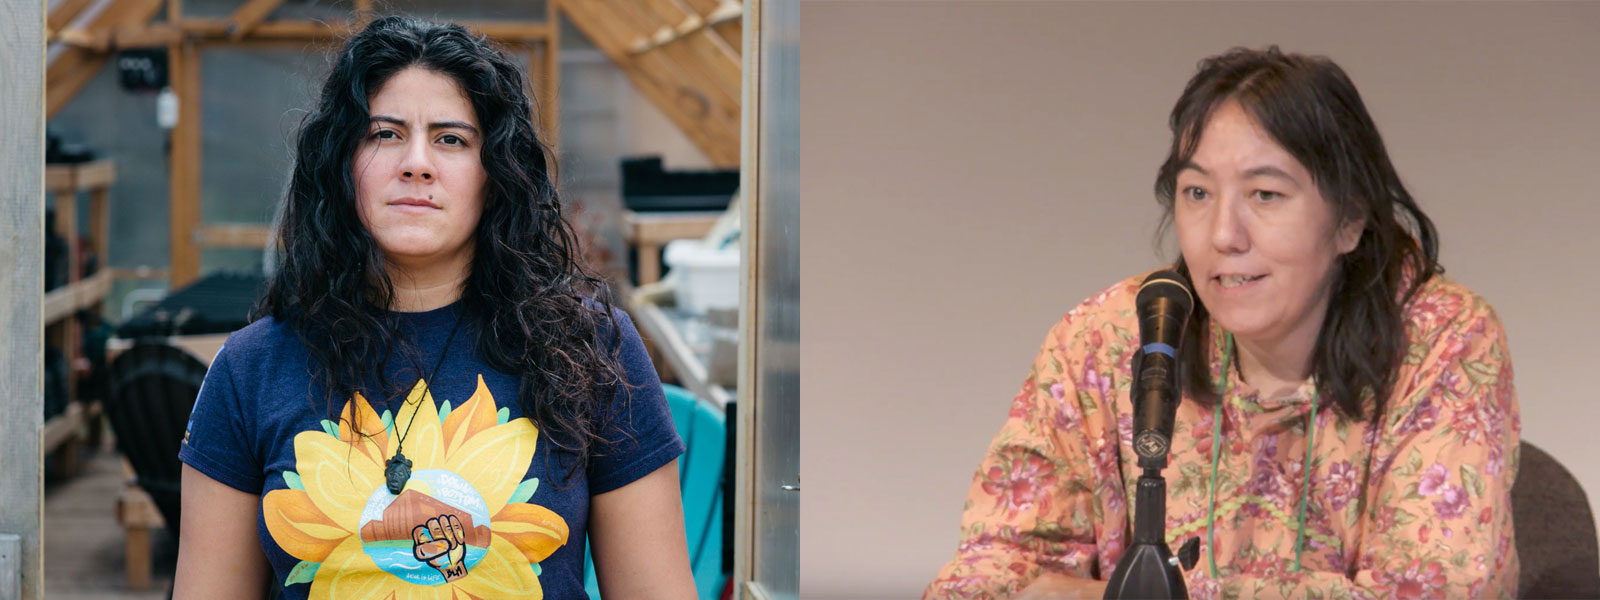 Left: Maria Lopez-Nunez. Credit: Earthjustice | Right: Rosemary Ahtuangaruak. Credit: Alaska Community Action on Toxics